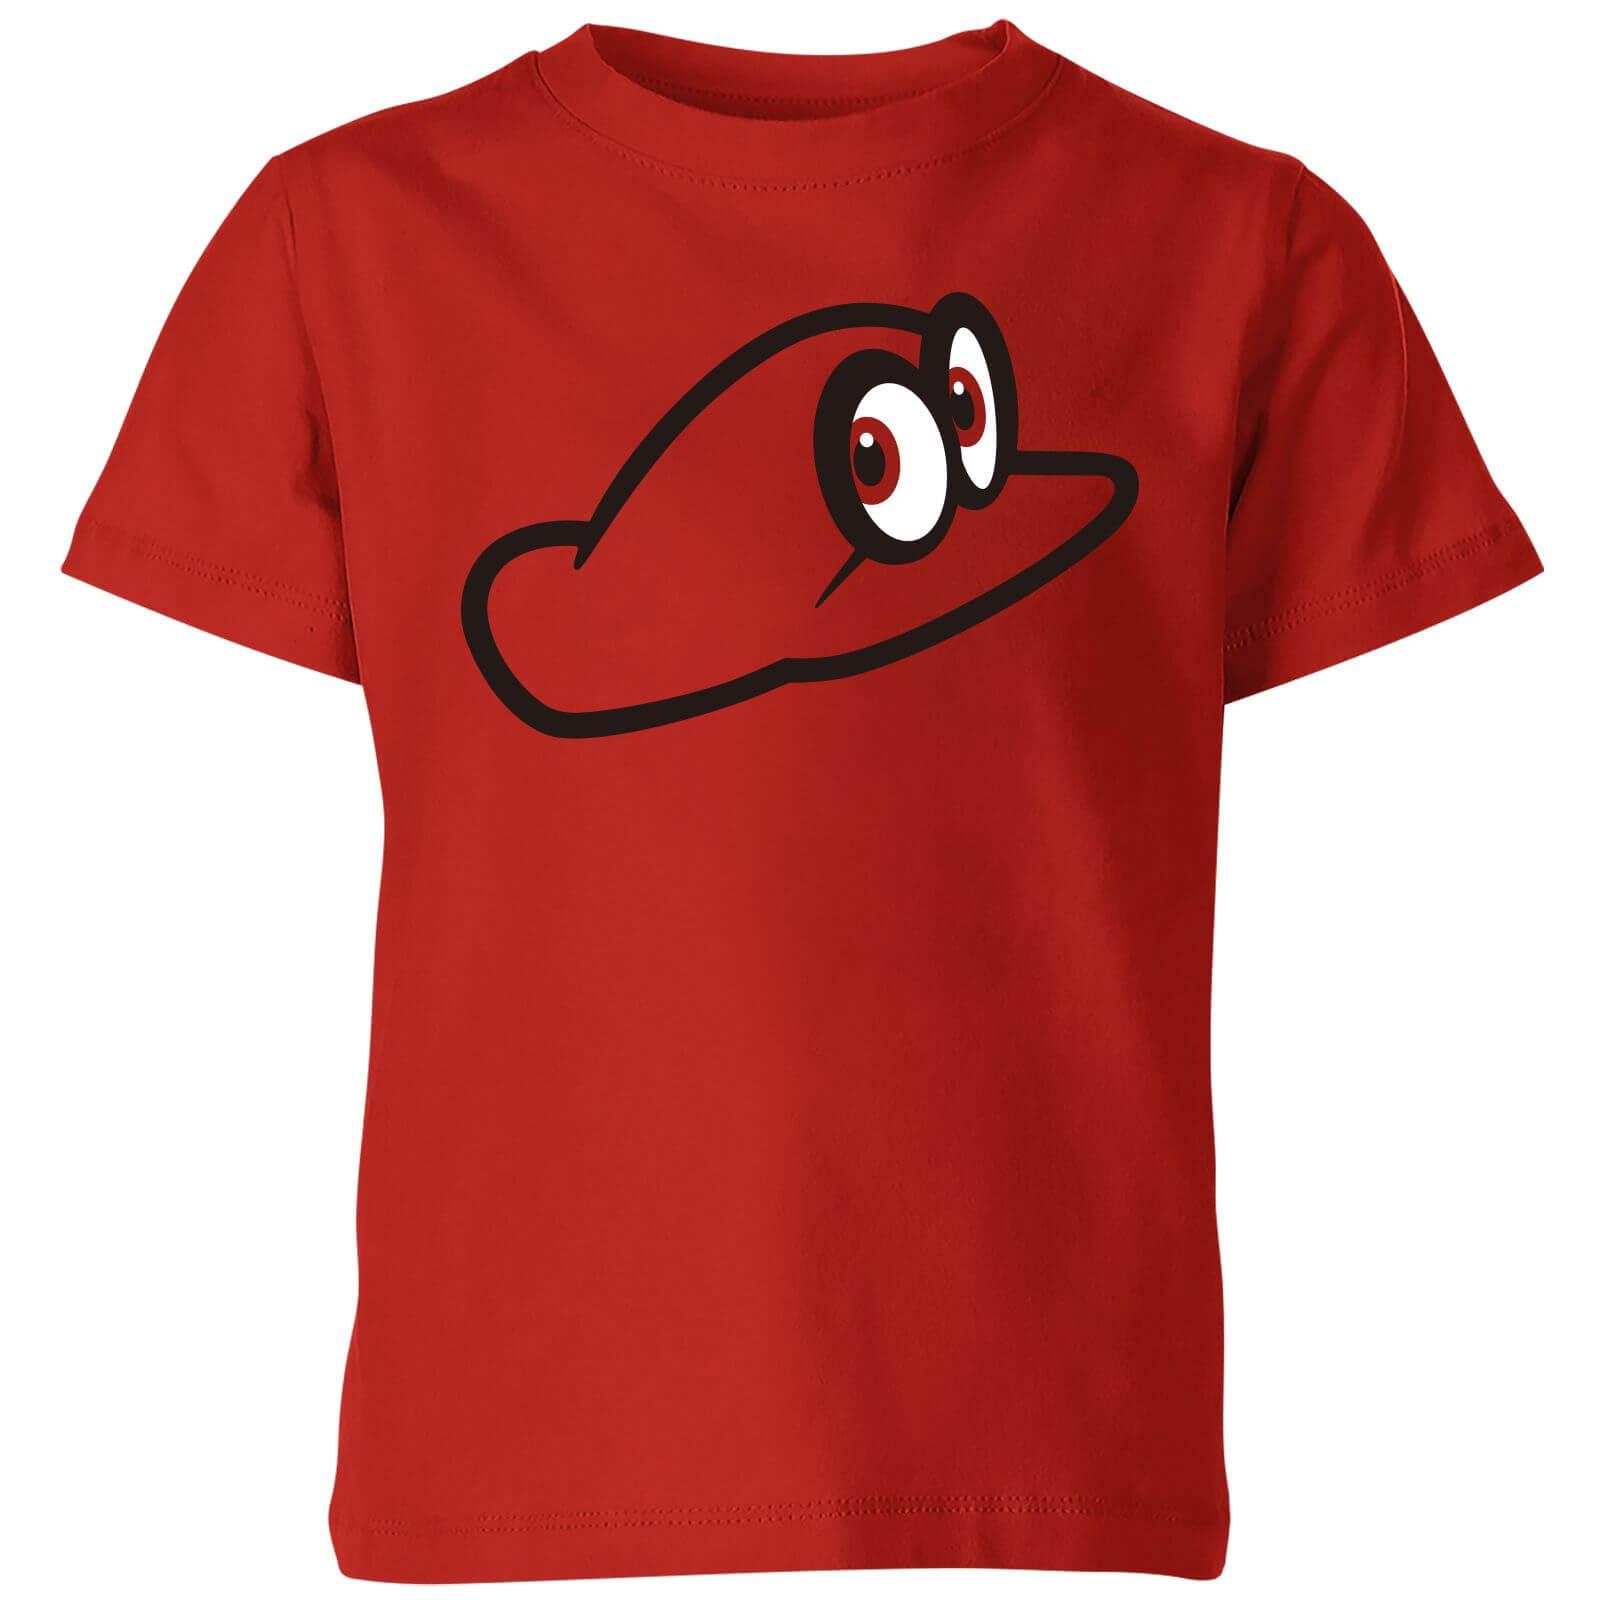 Nintendo Super Mario Odyssey Cappy Kid's T-Shirt - Red